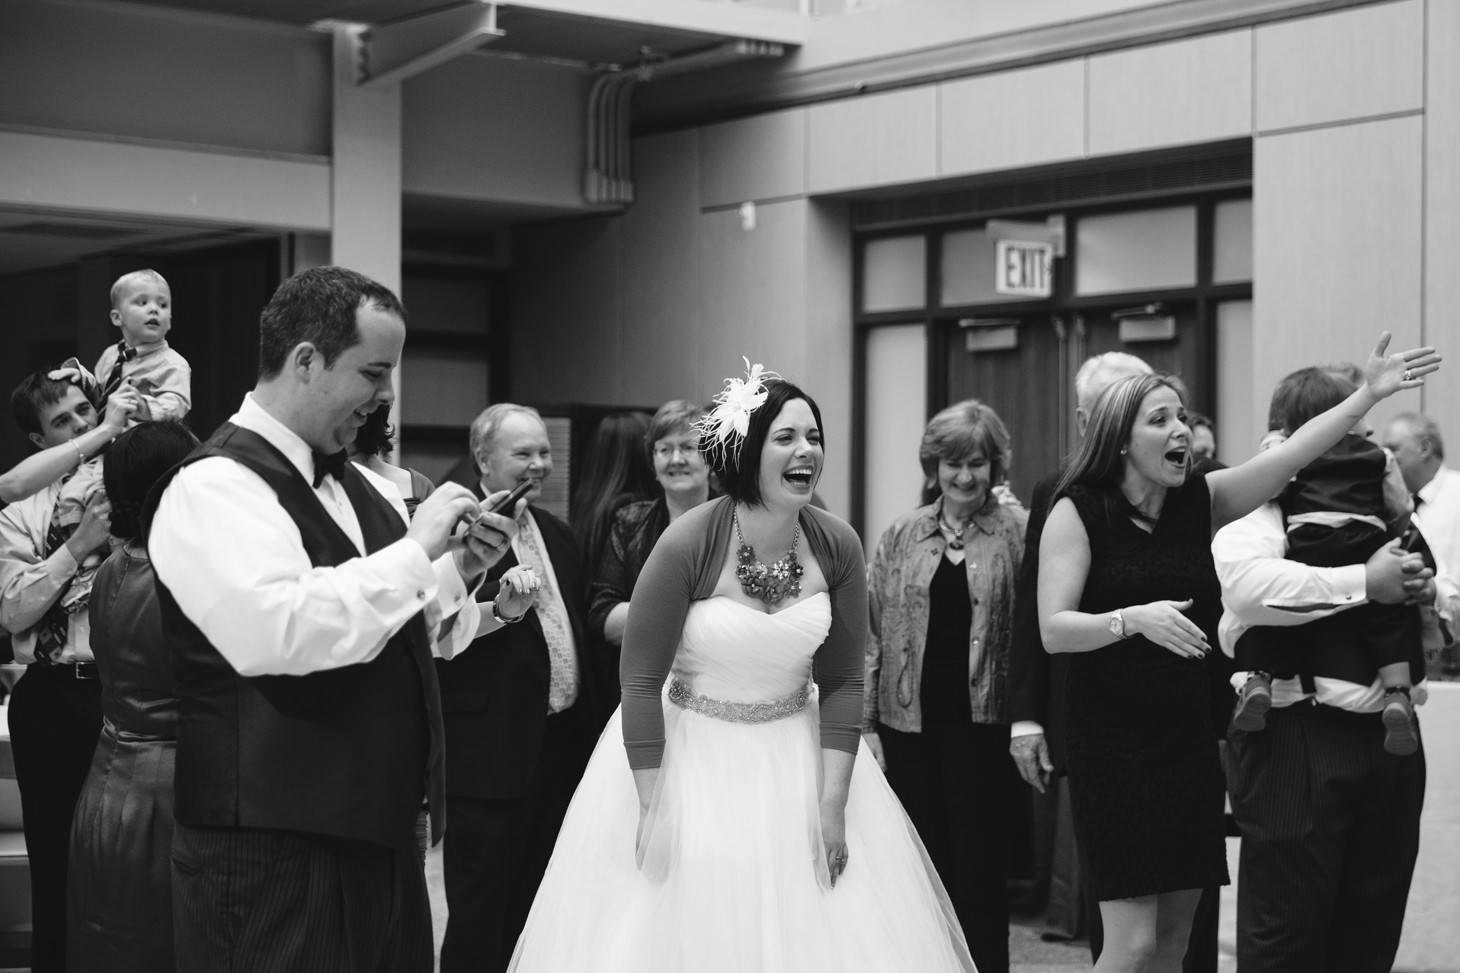 067-nyc-wedding-photographer-smitten-chickens-nj-montclair-art-museum.jpg